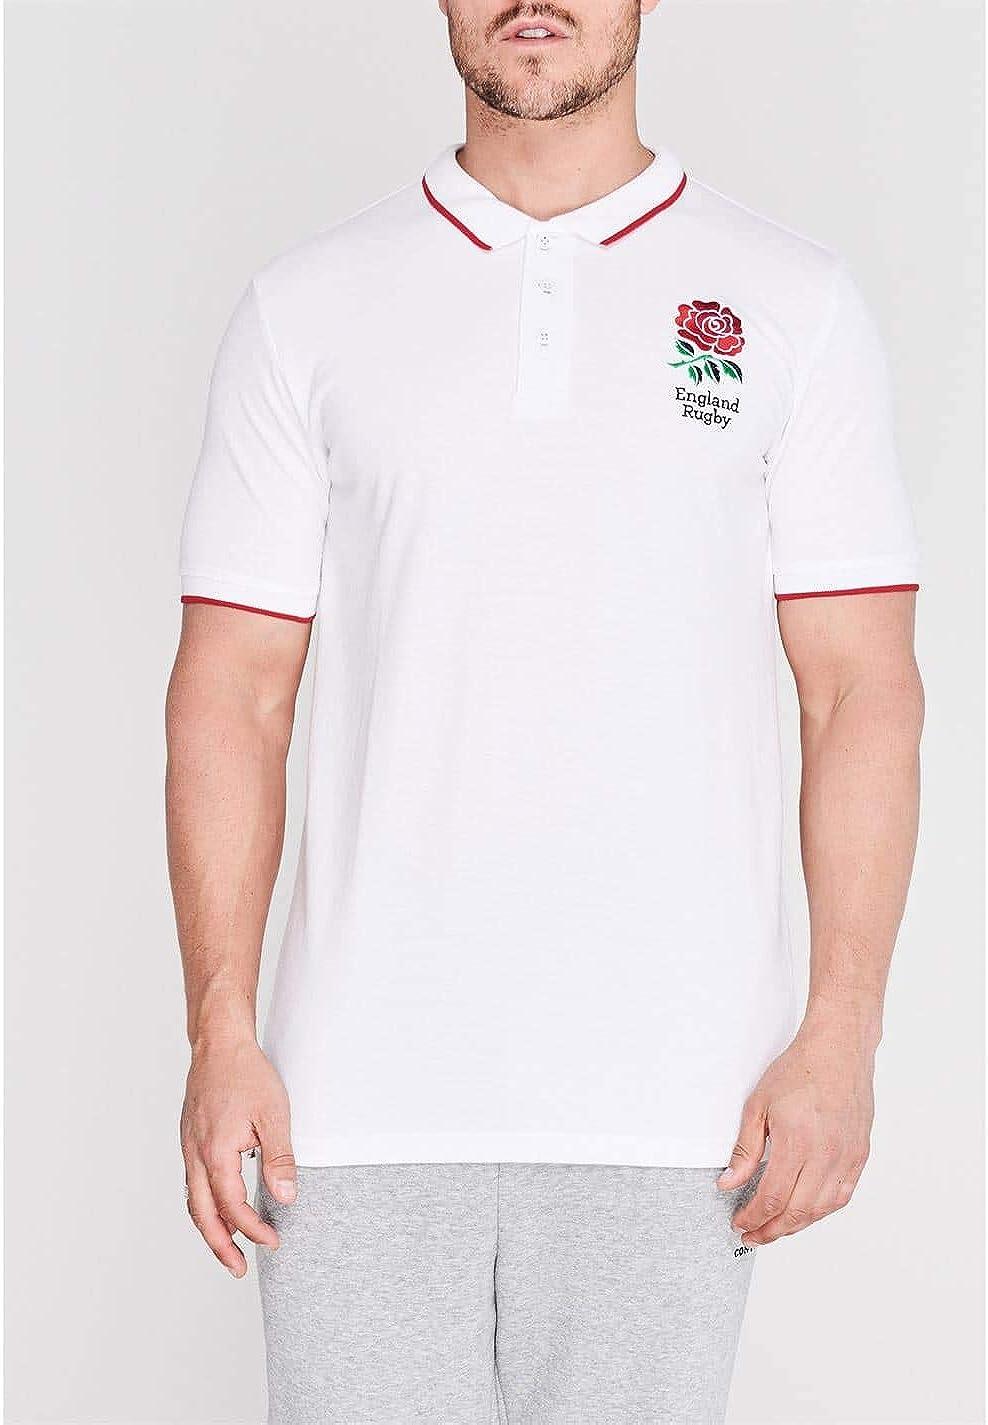 RFU Hombre England Rugby Core Polo Camisa Camiseta Ropa Deporte ...